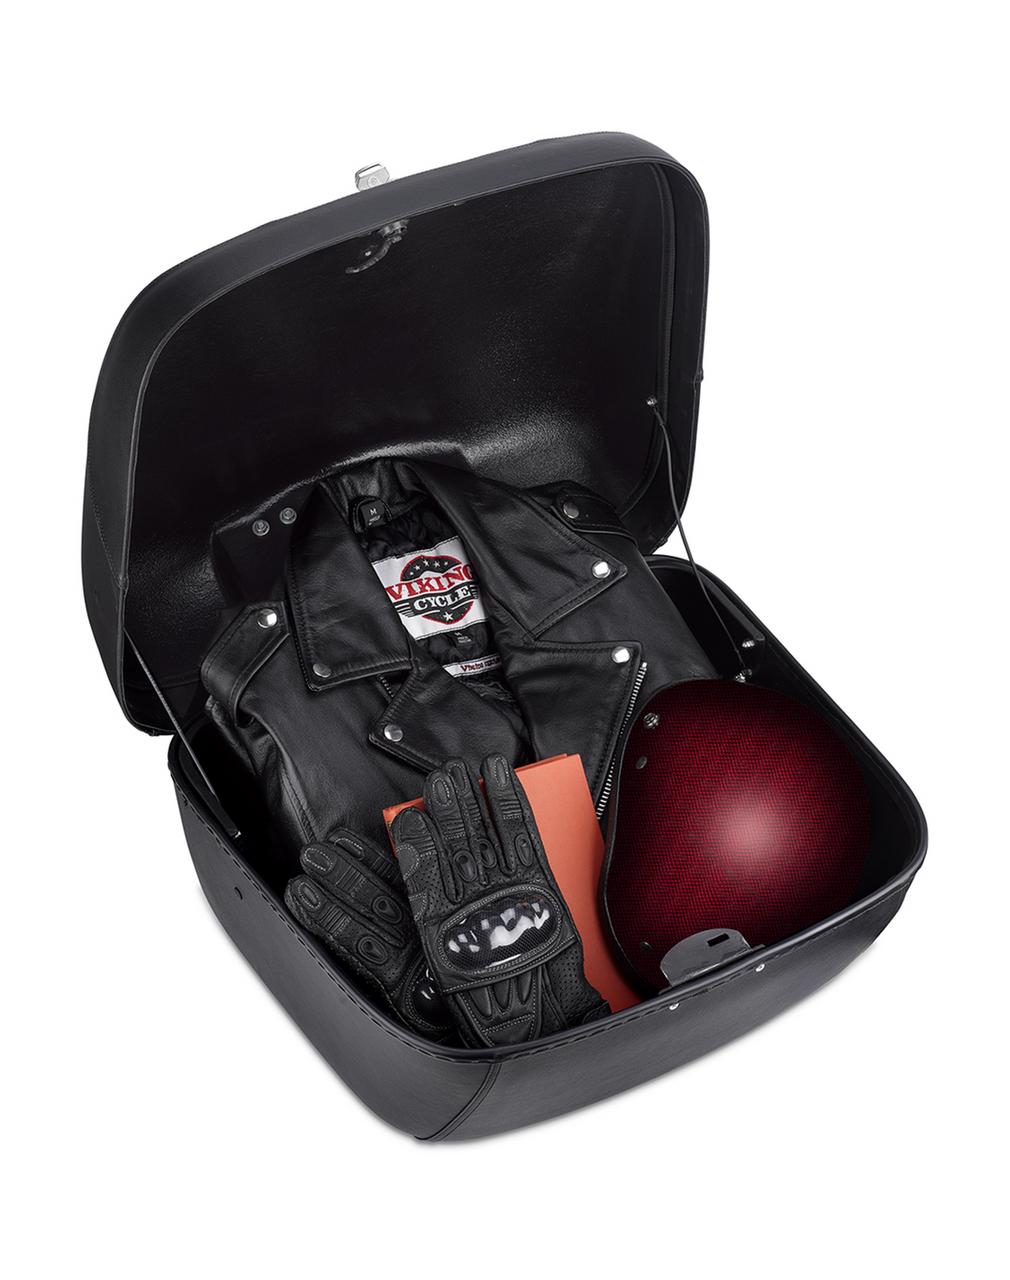 Suzuki Viking Premium Leather Wrapped Hard Trunk Storage View